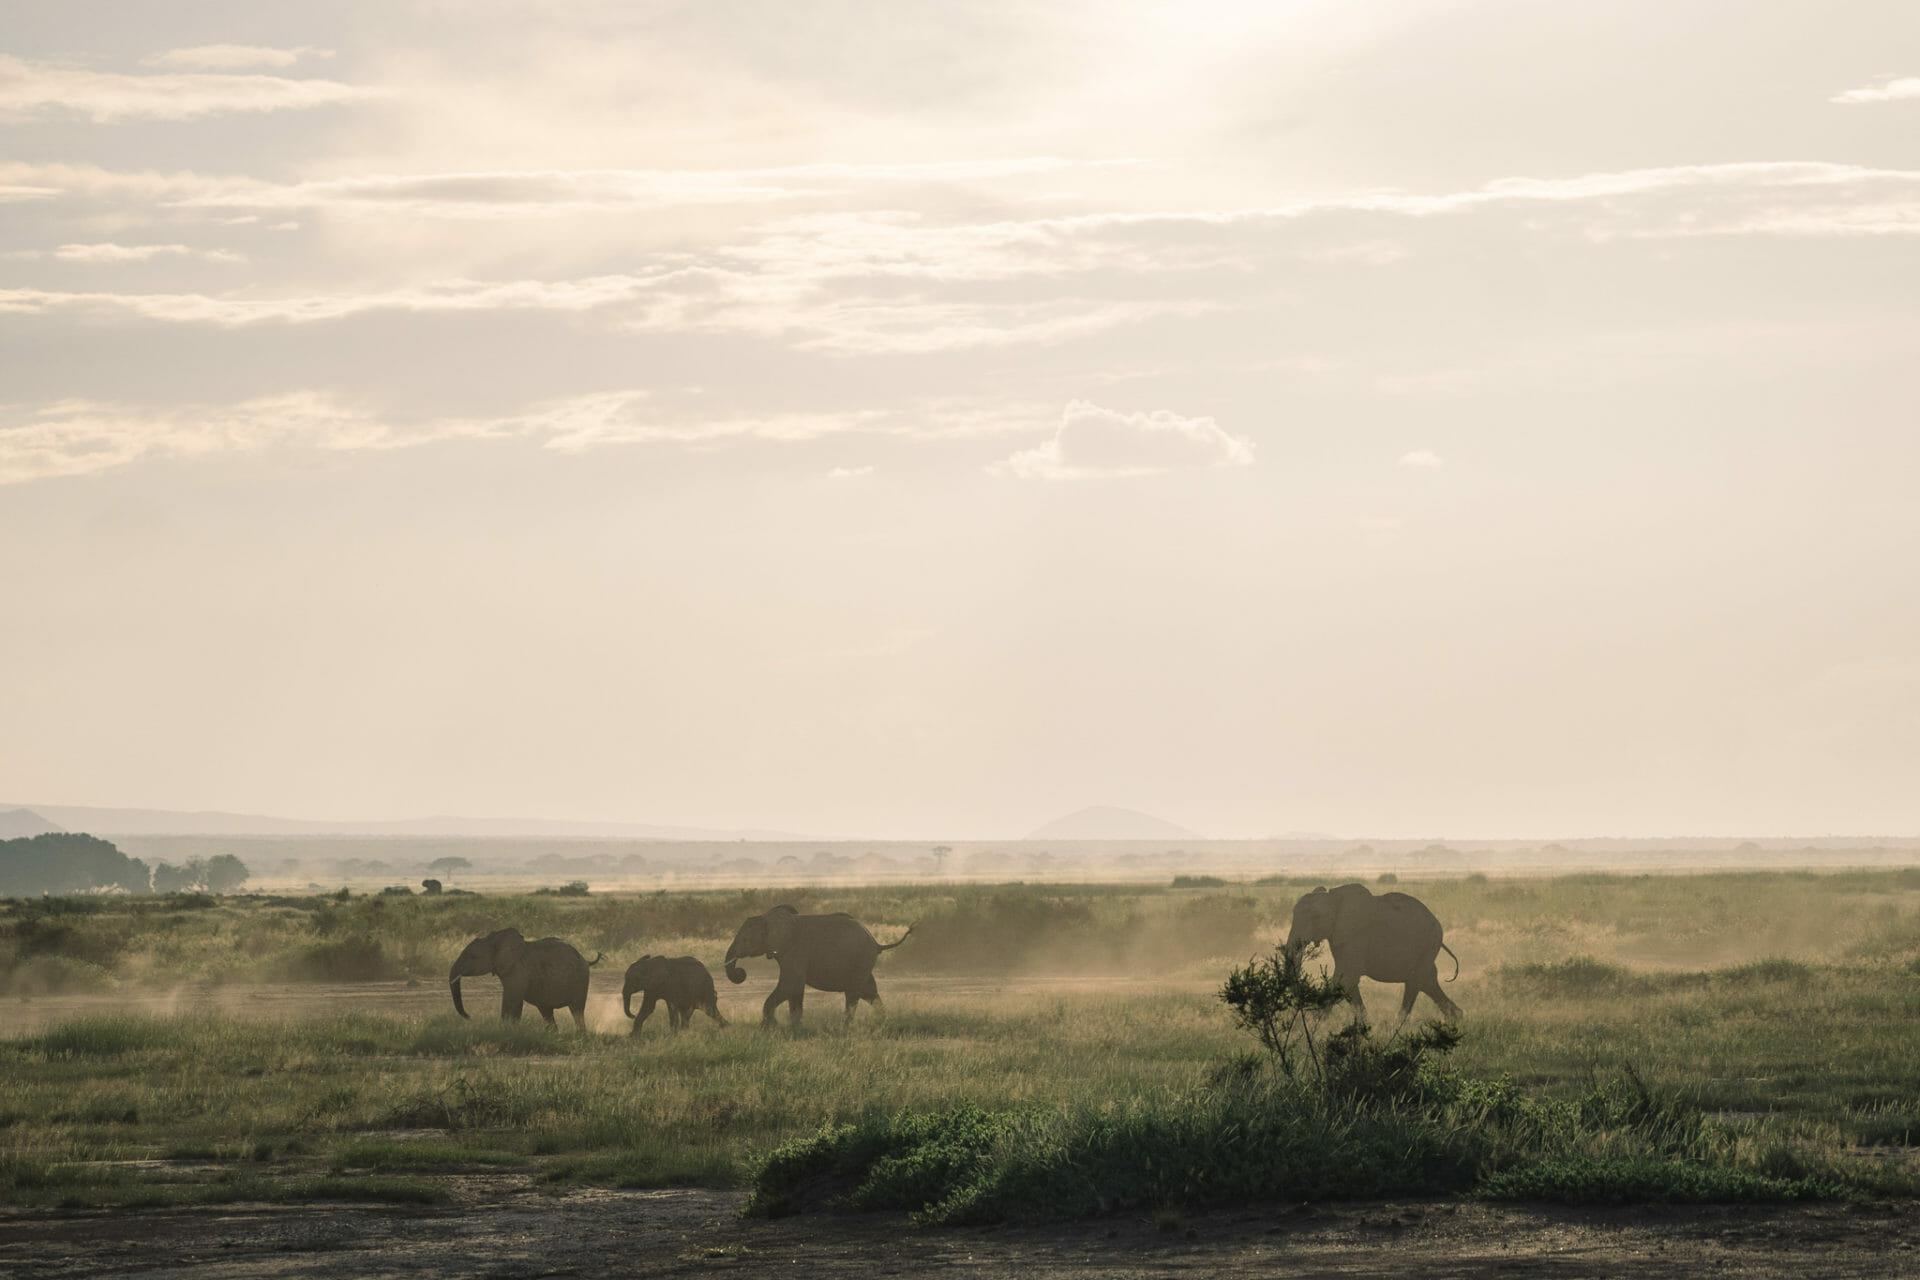 kenya-parc-amboseli-safari-elephant